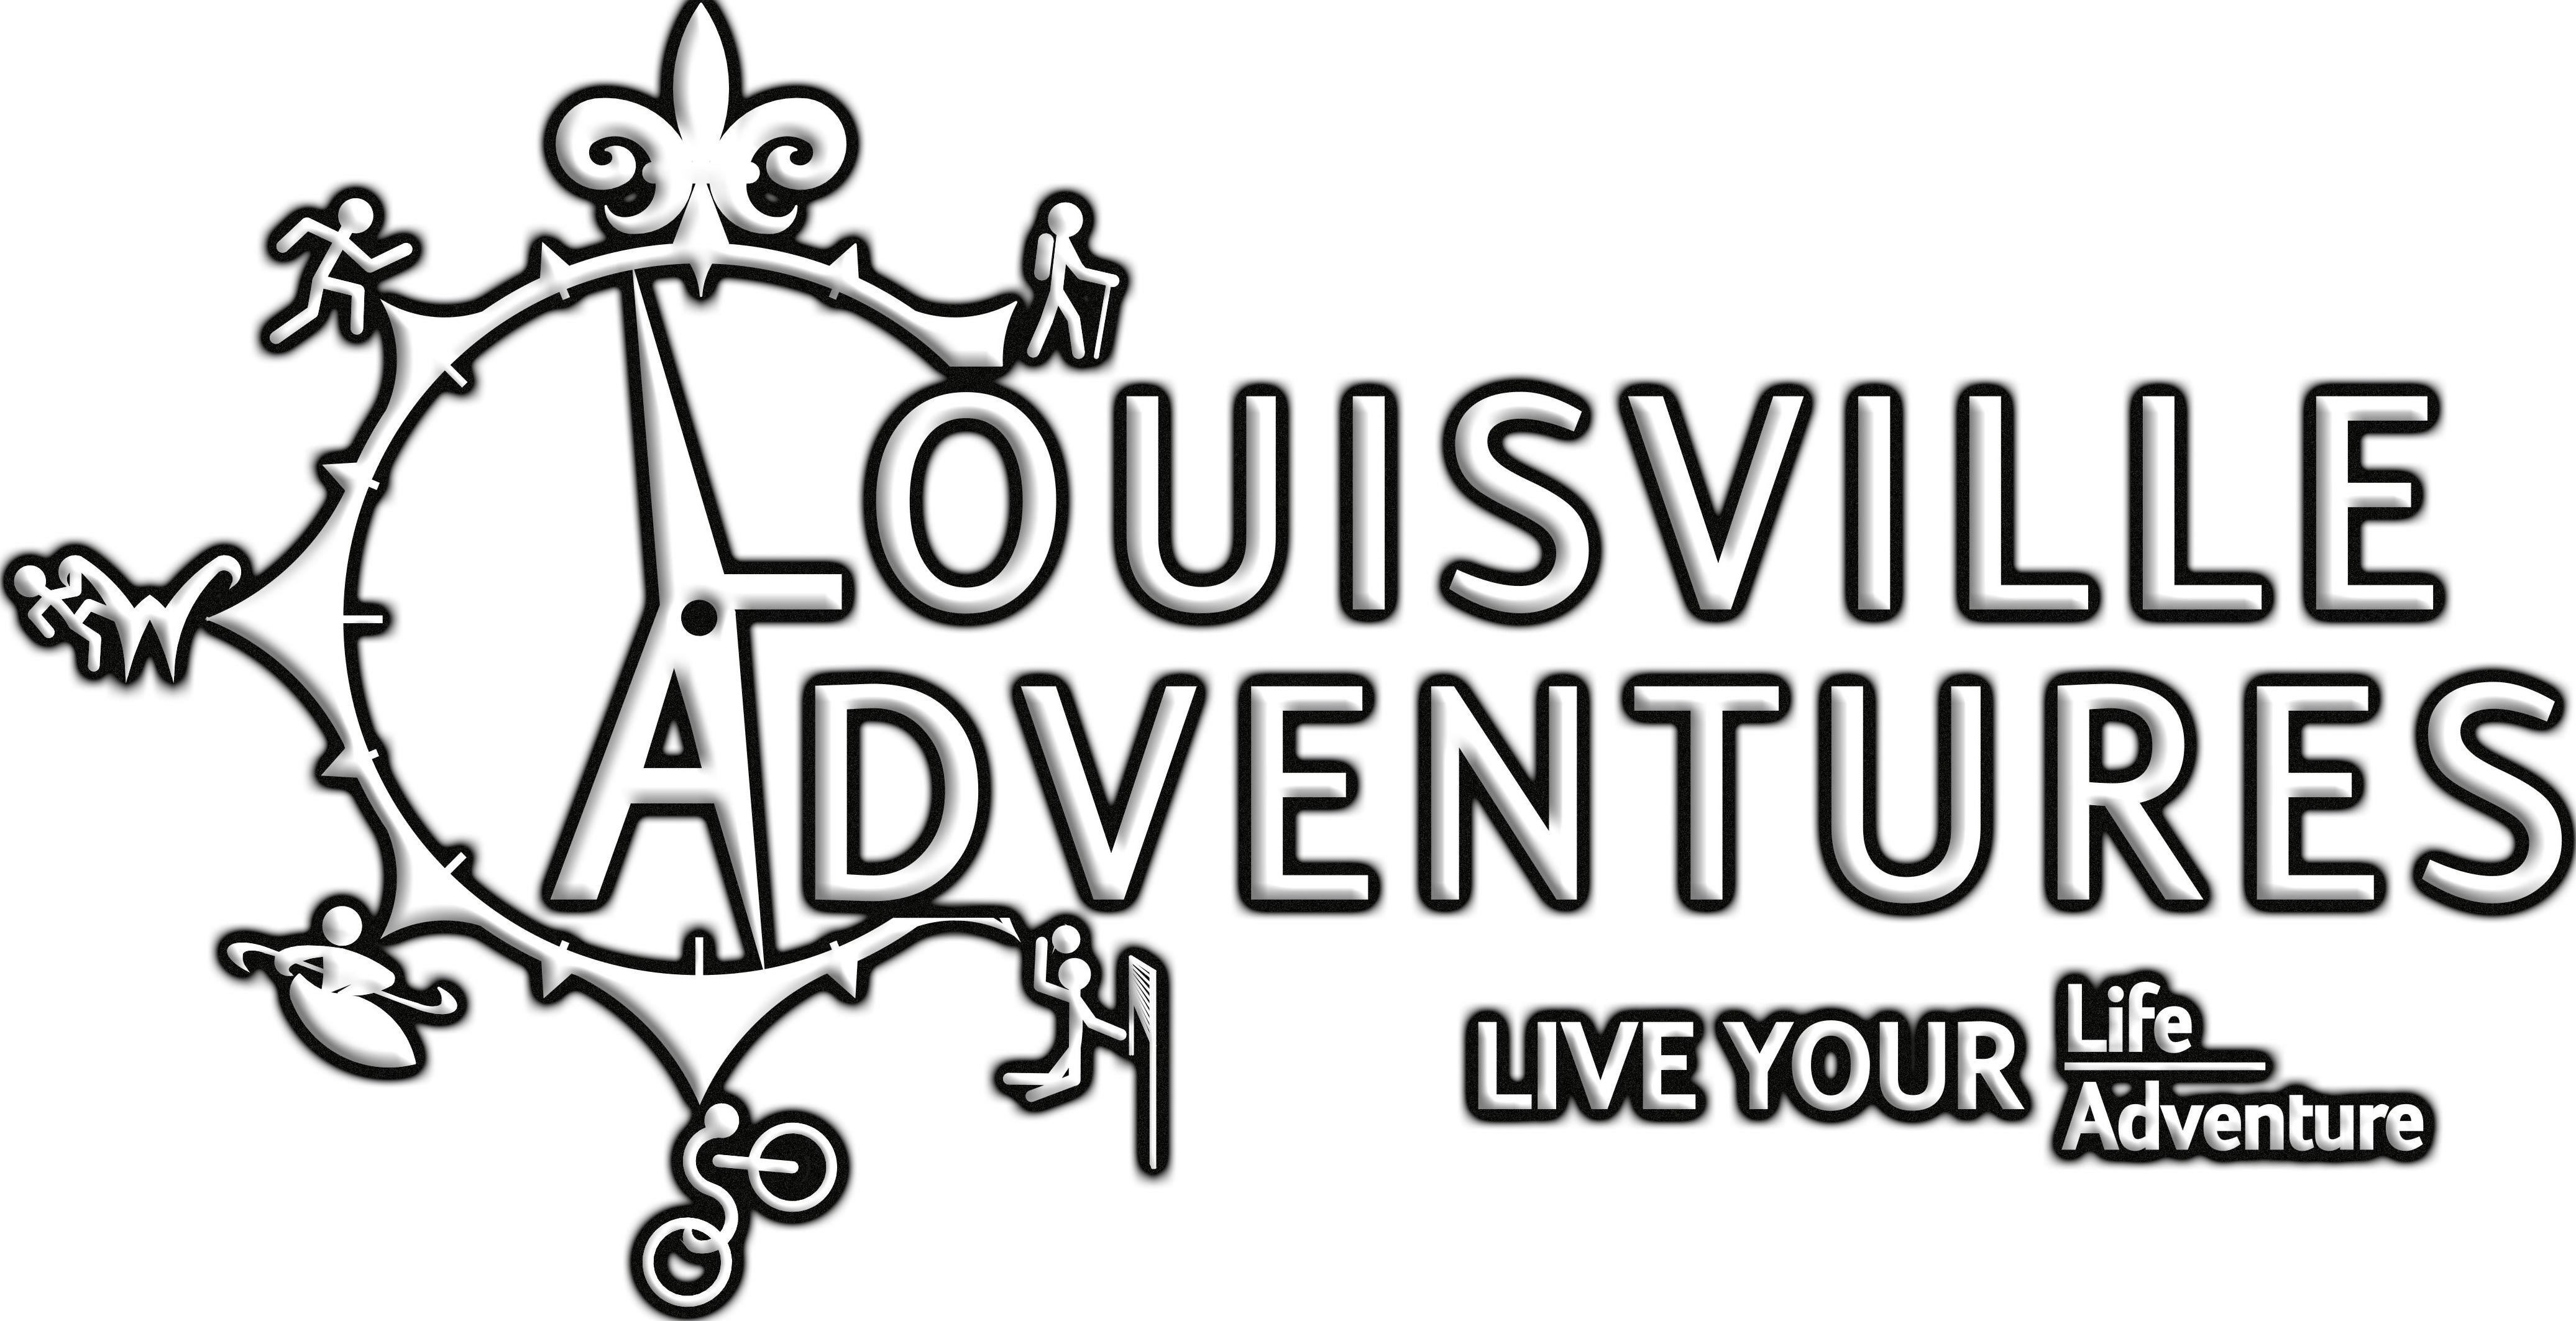 Trademark Logo LOUISVILLE ADVENTURES. LIVE YOUR LIFE. LIVE YOUR ADVENTURE.